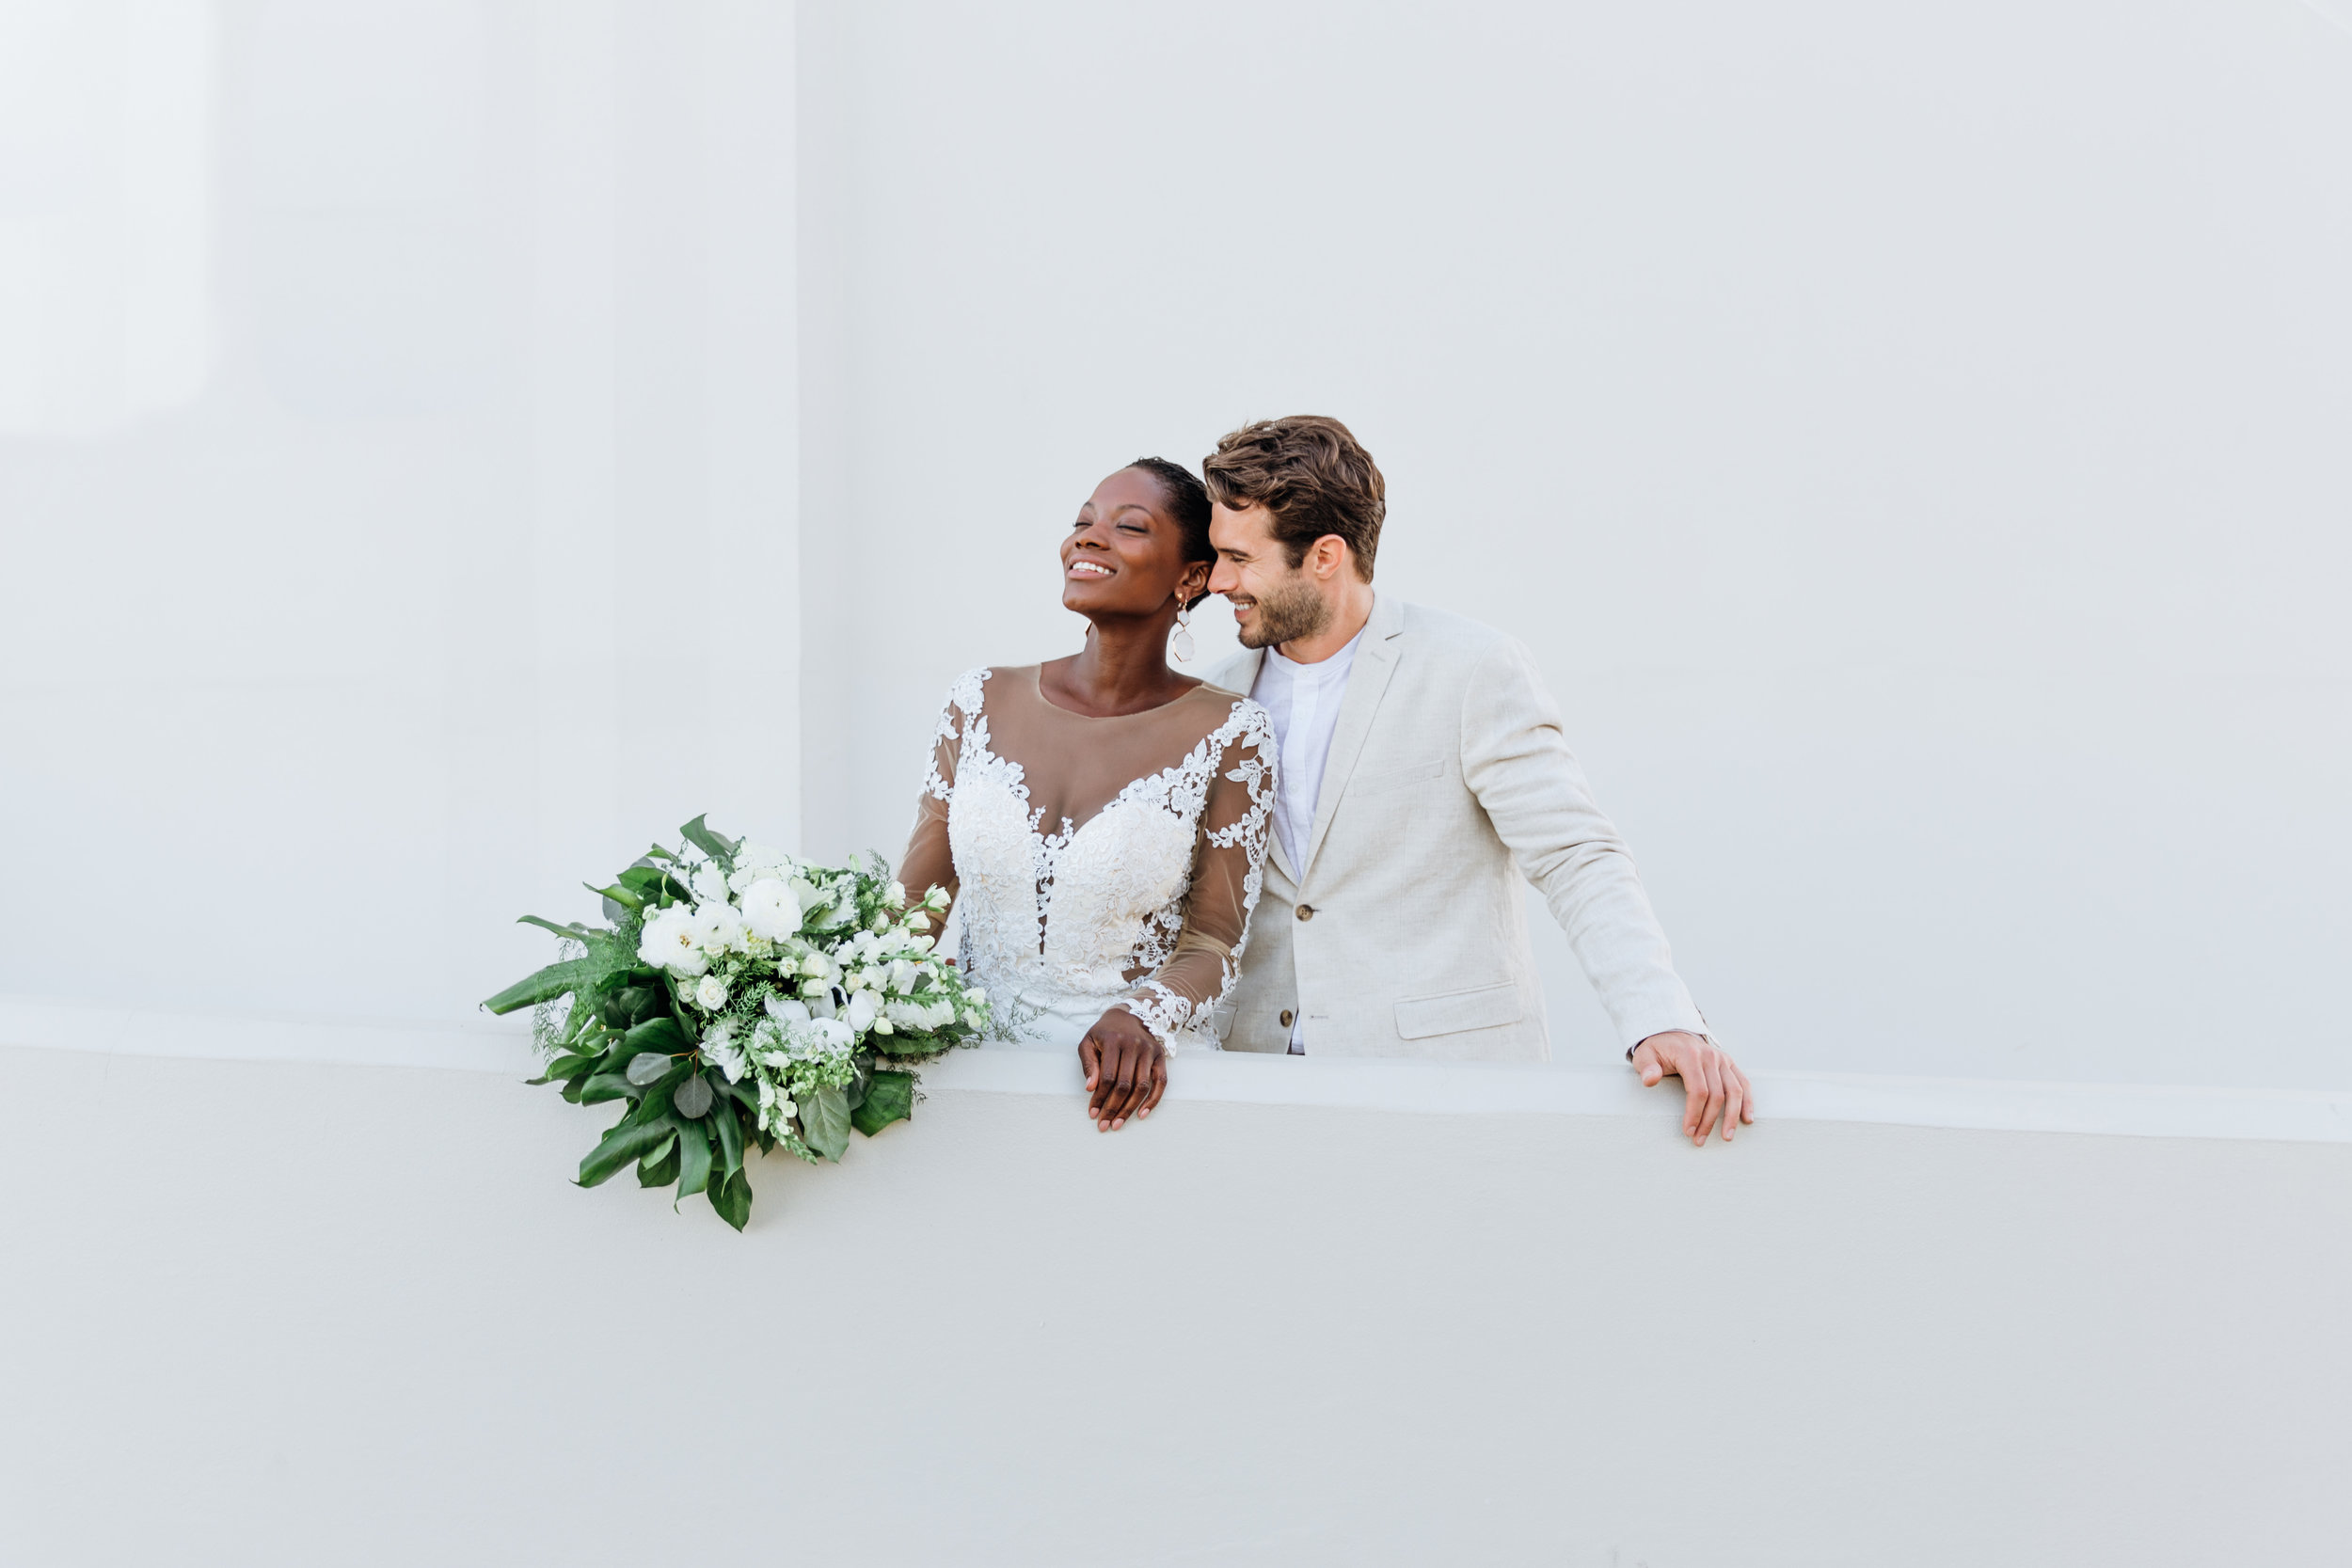 los-angeles-california-griffith-observatory-wedding-bridal-photography-michael-cozzens-36.jpg